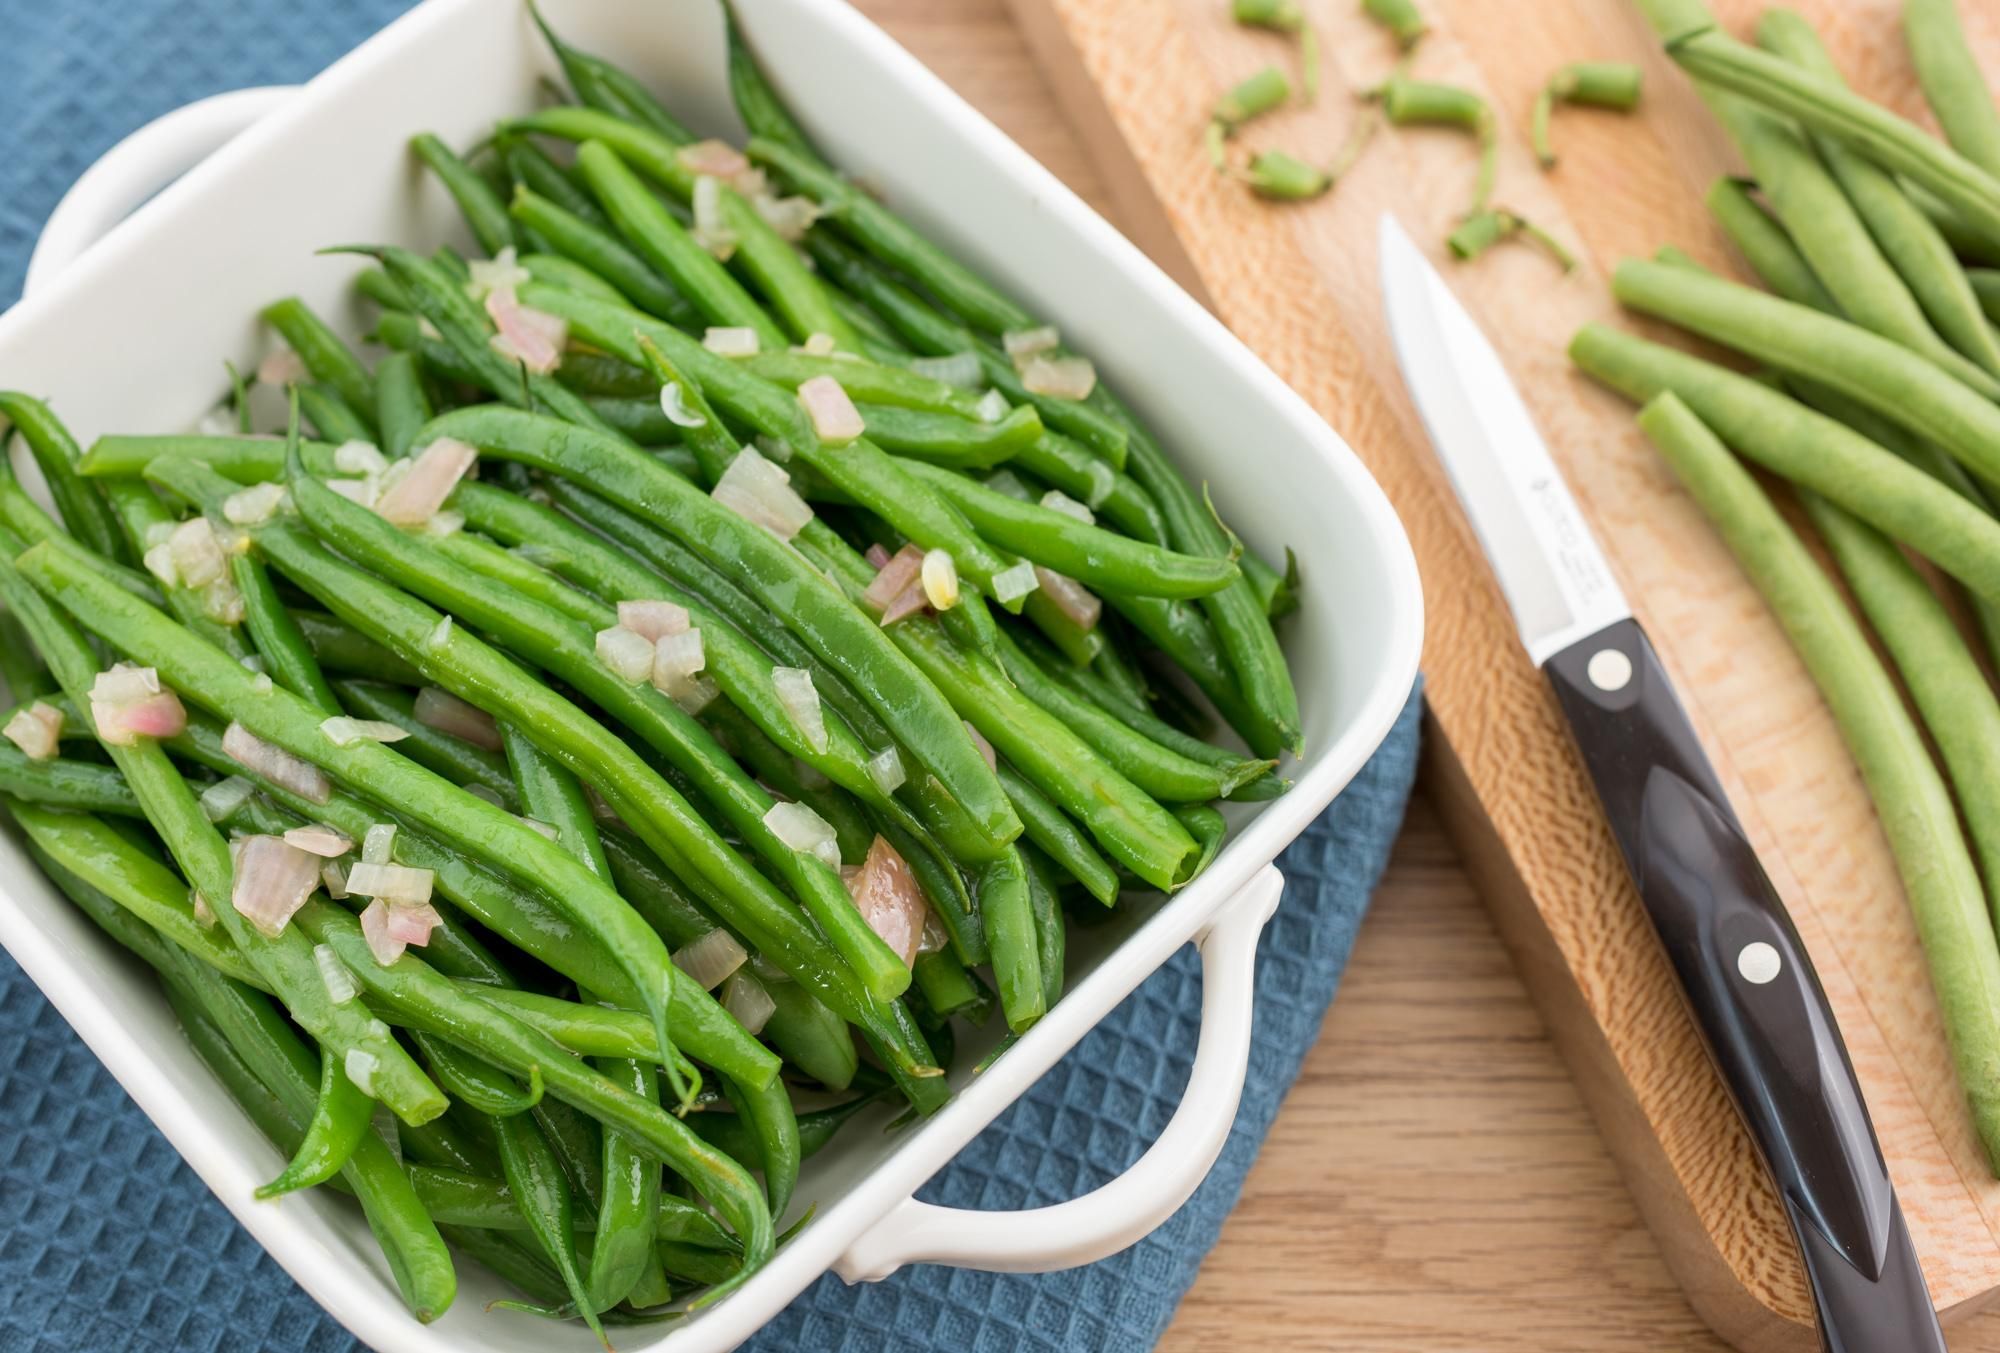 Green Beans with Warm Shallot Vinaigrette